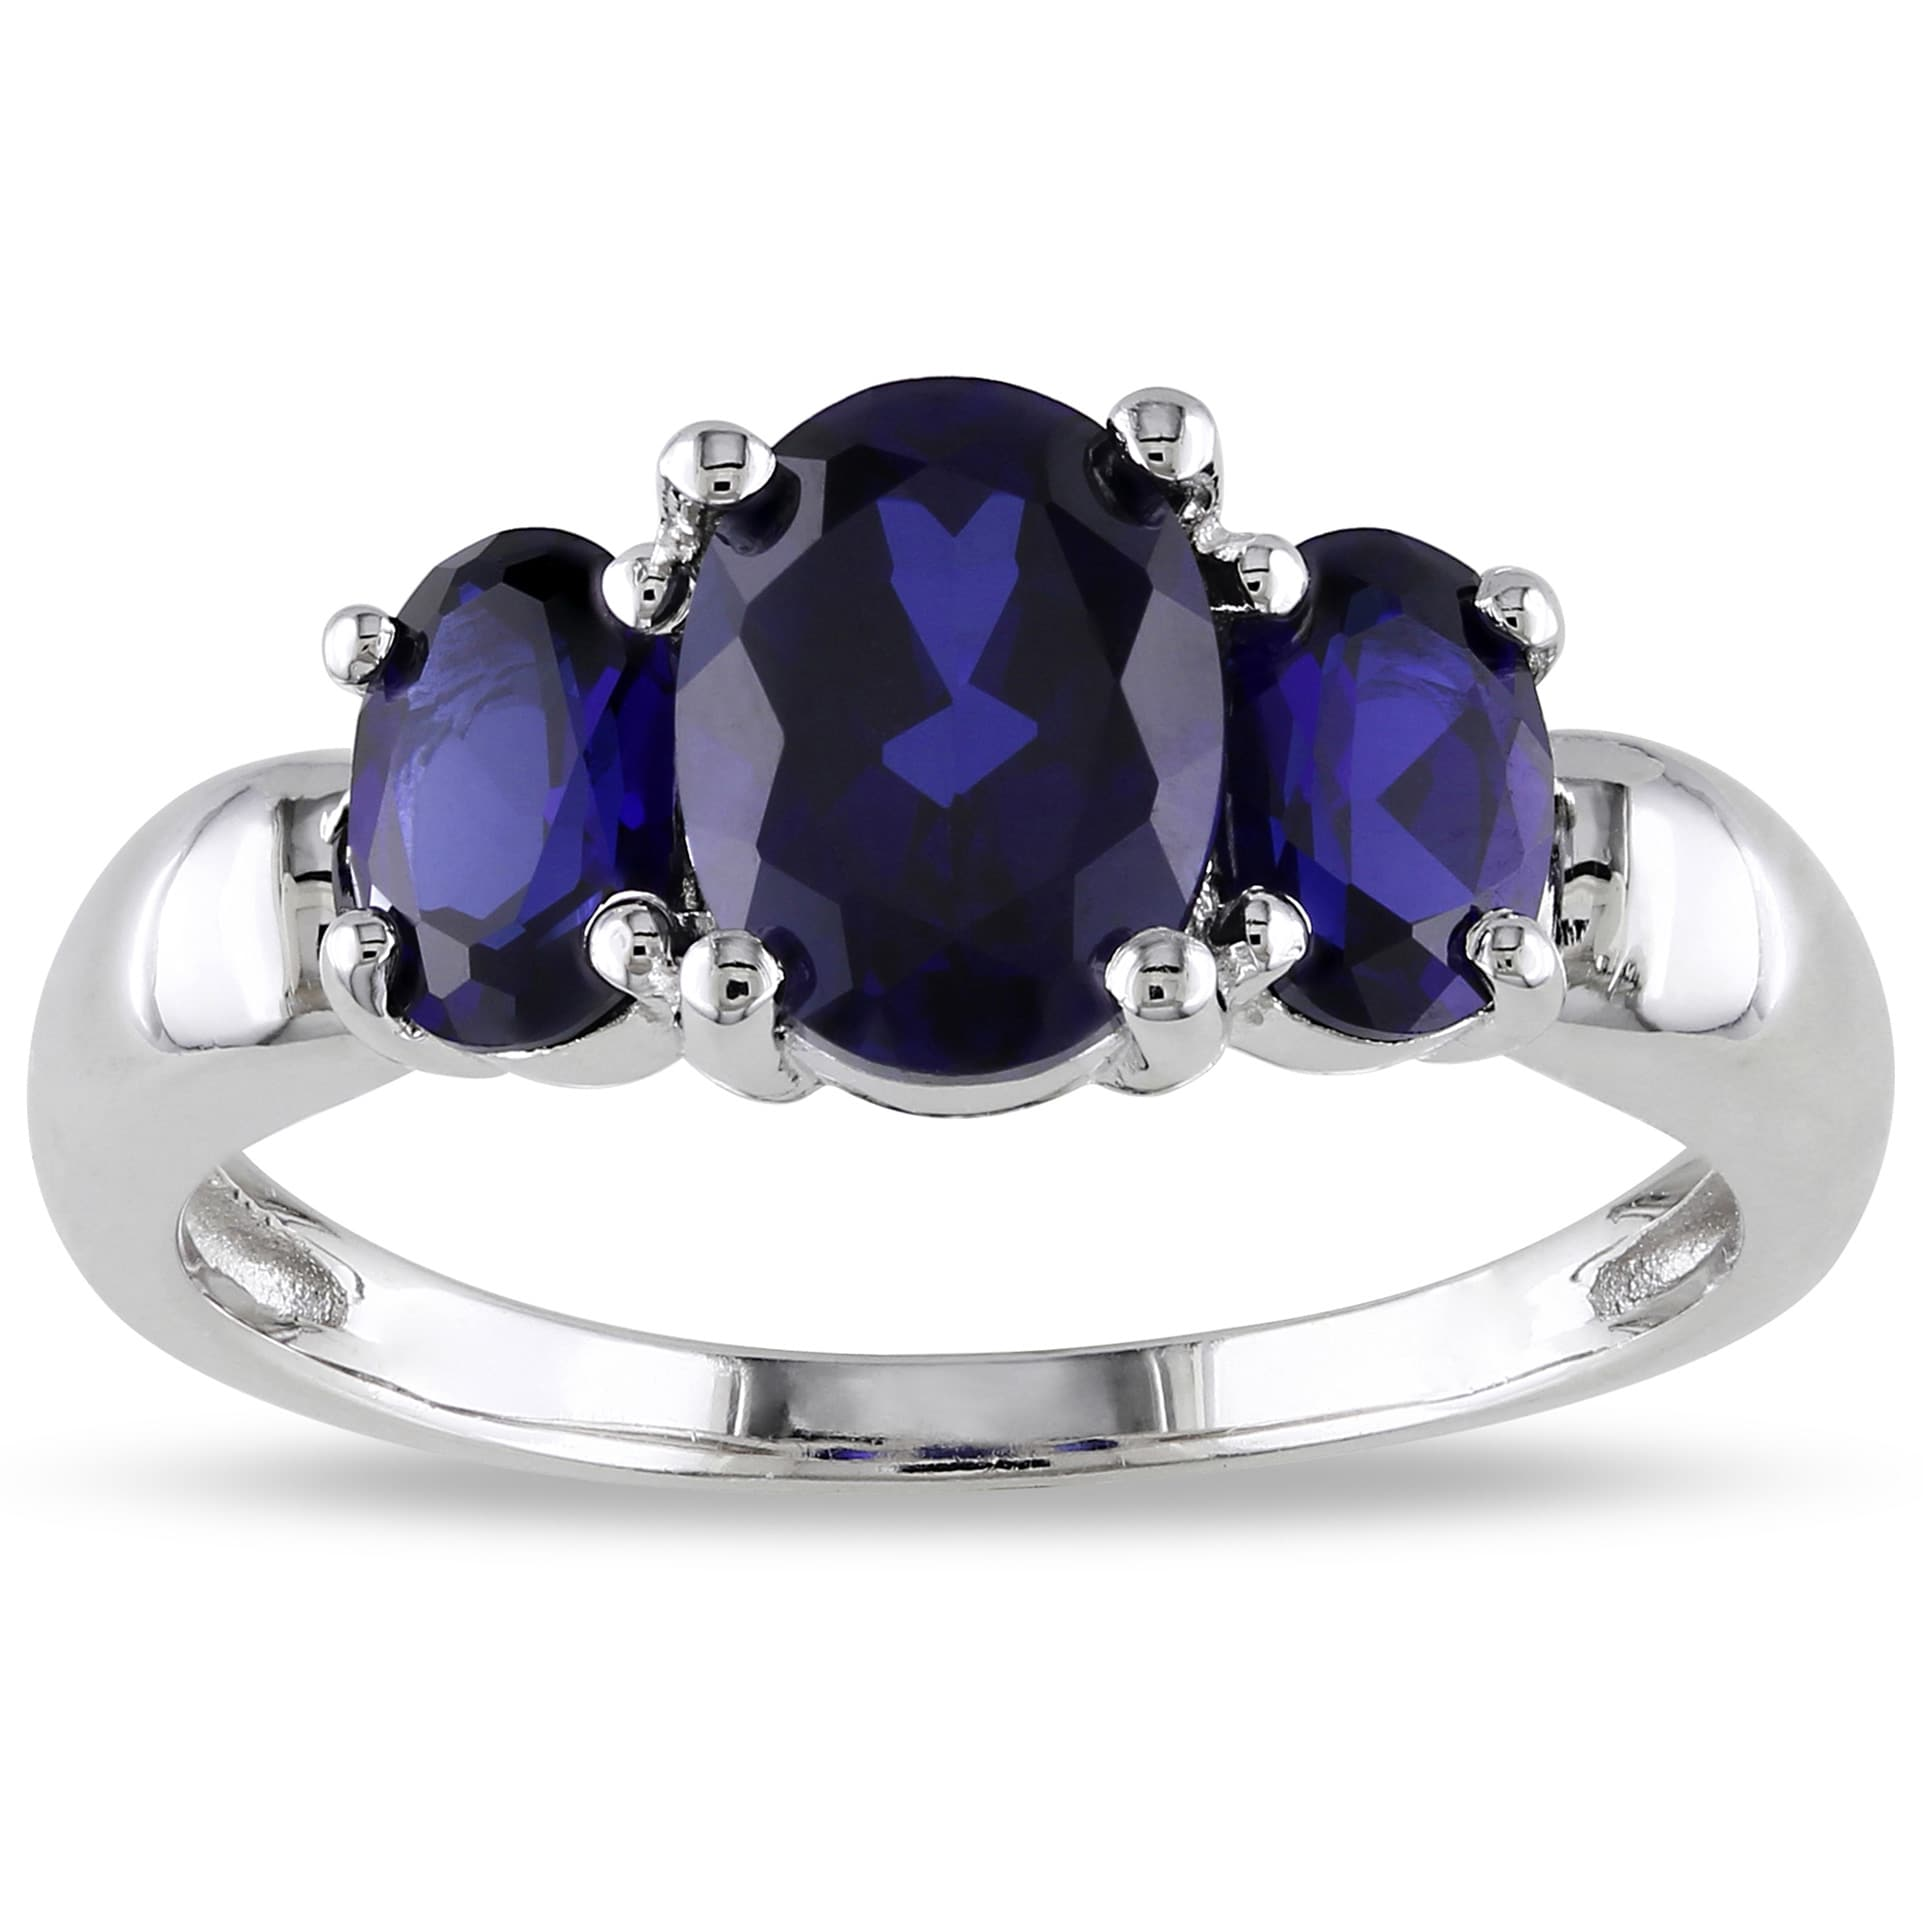 Gemstone, Sapphire Jewelry Buy Necklaces, Earrings